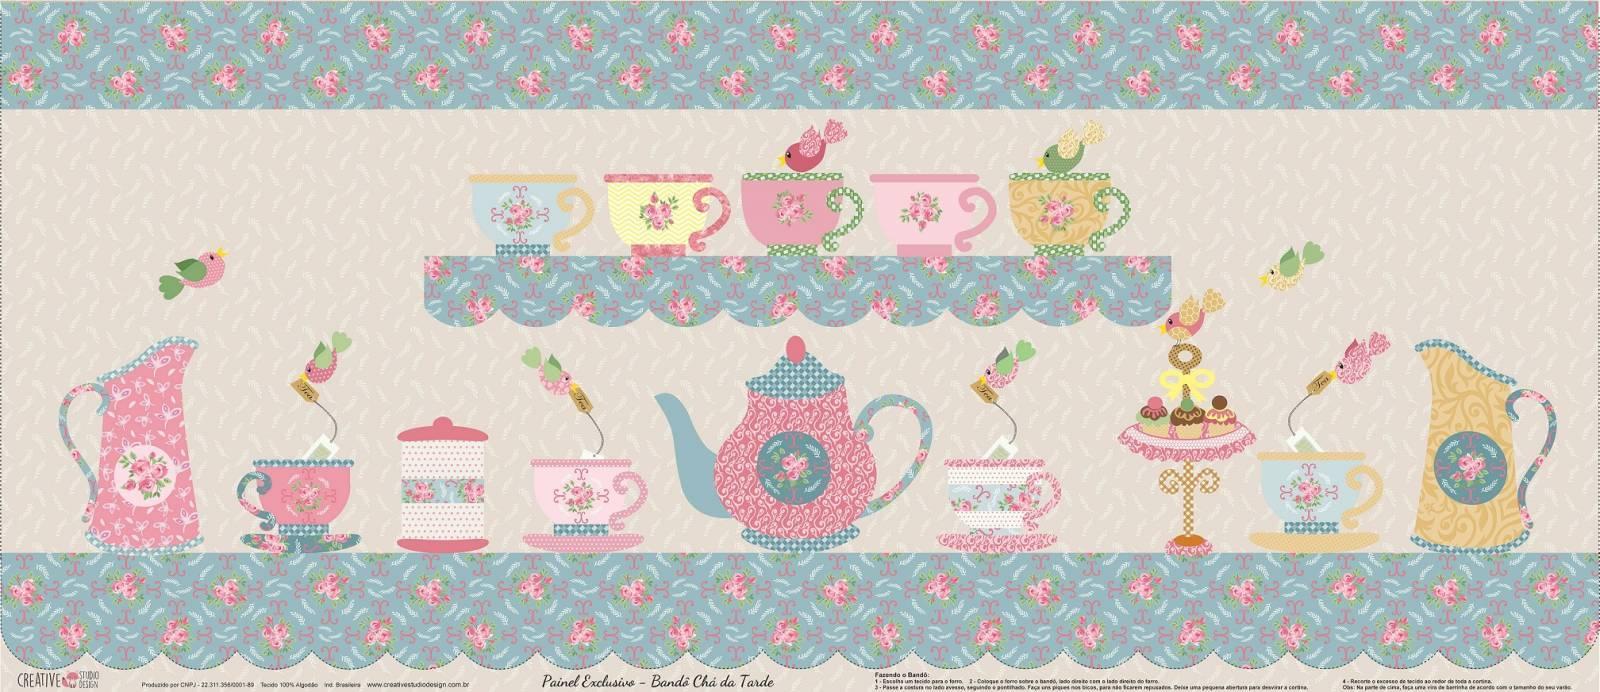 Bandô Chá Da Tarde - Ref. CS002 - Creative Studio Design - Armarinhos Nodari